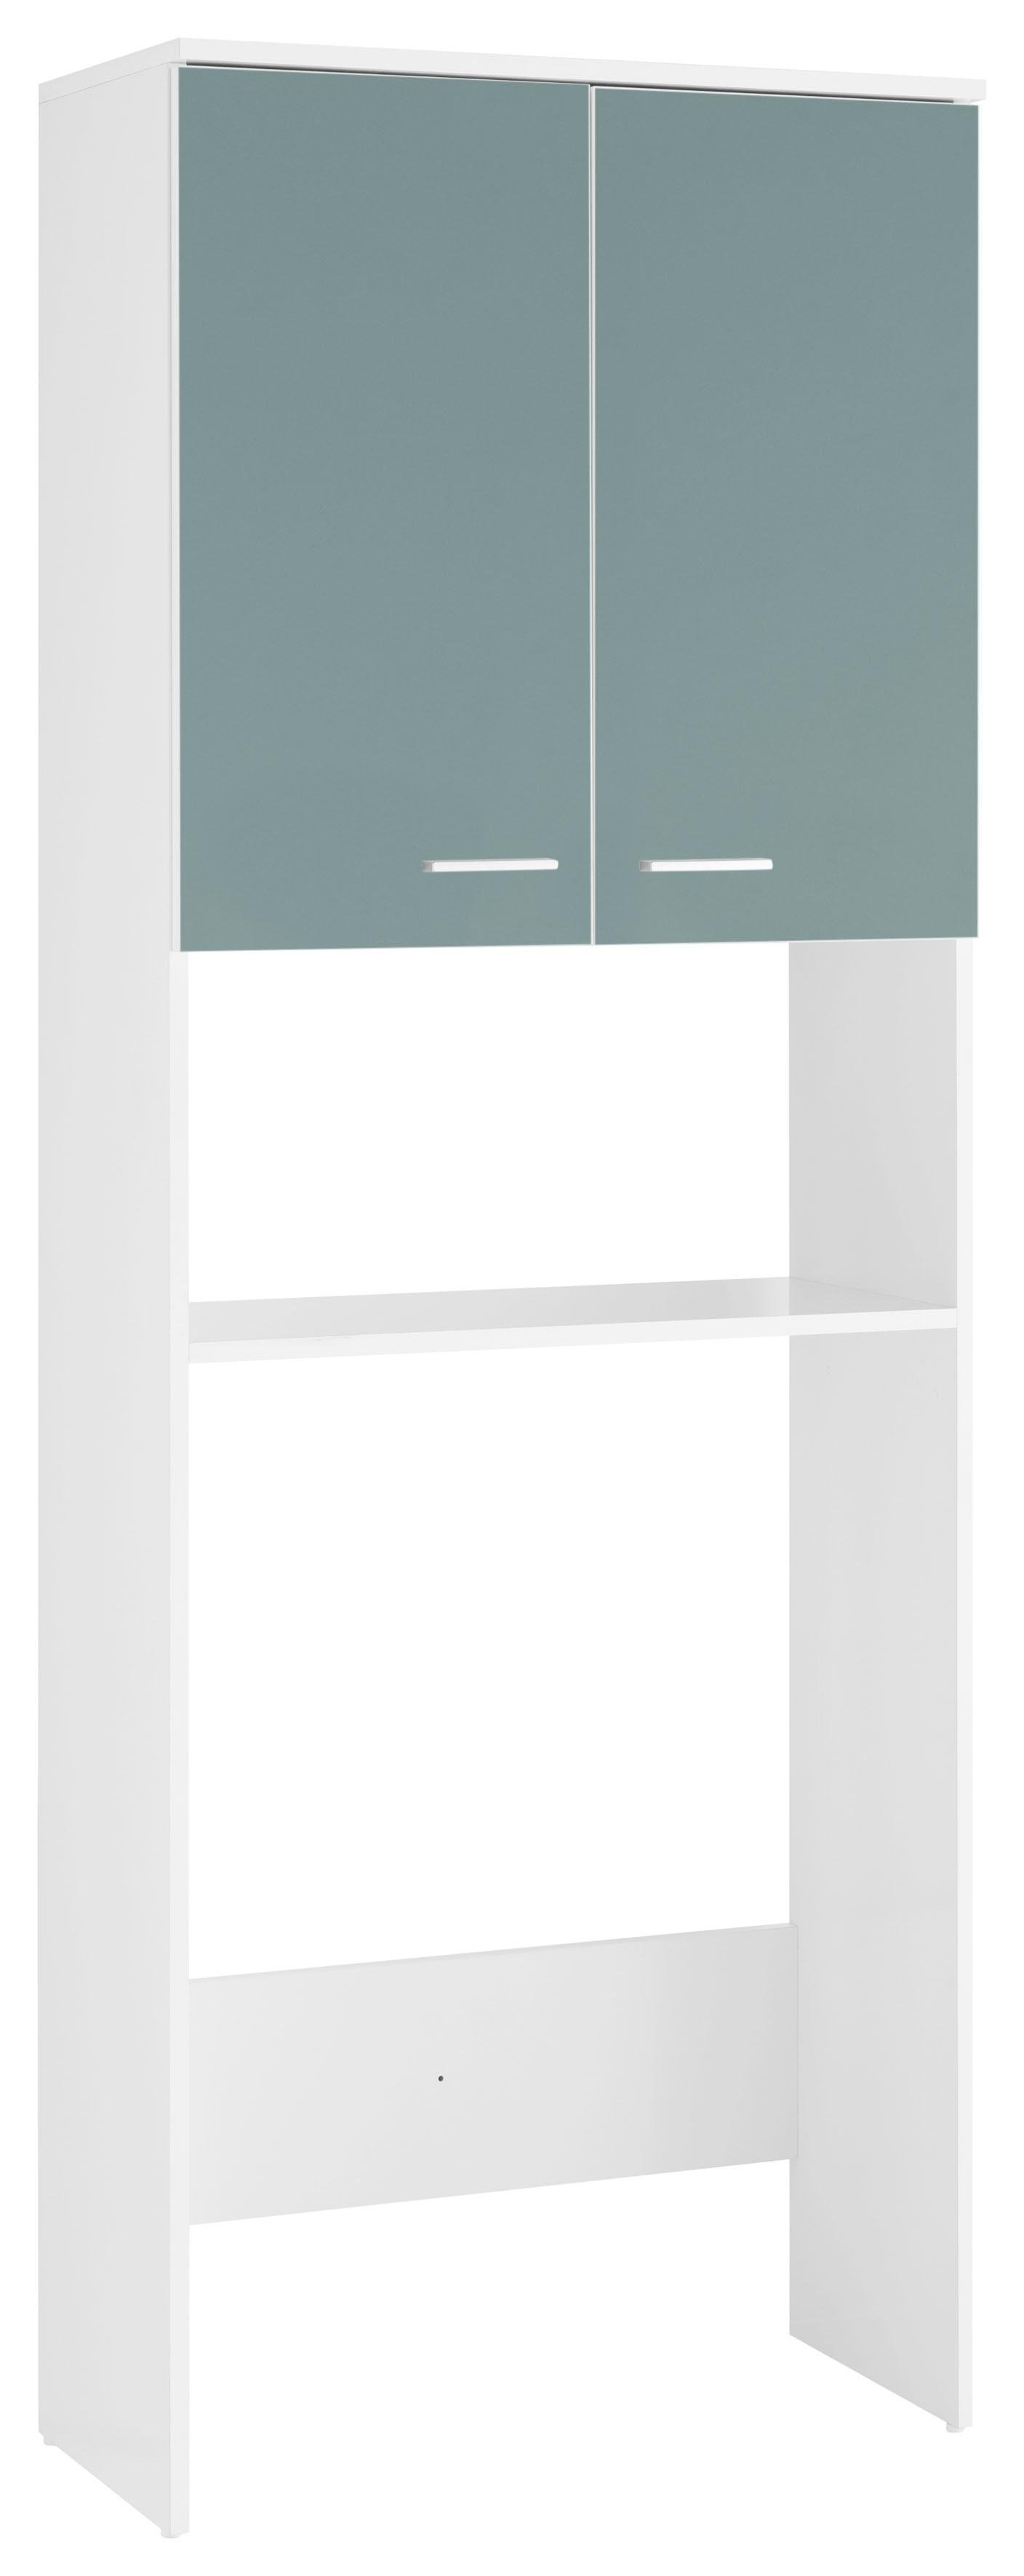 Verrassend Keukenkast kopen? Meer dan 50 keukenkasten | OTTO FY-26